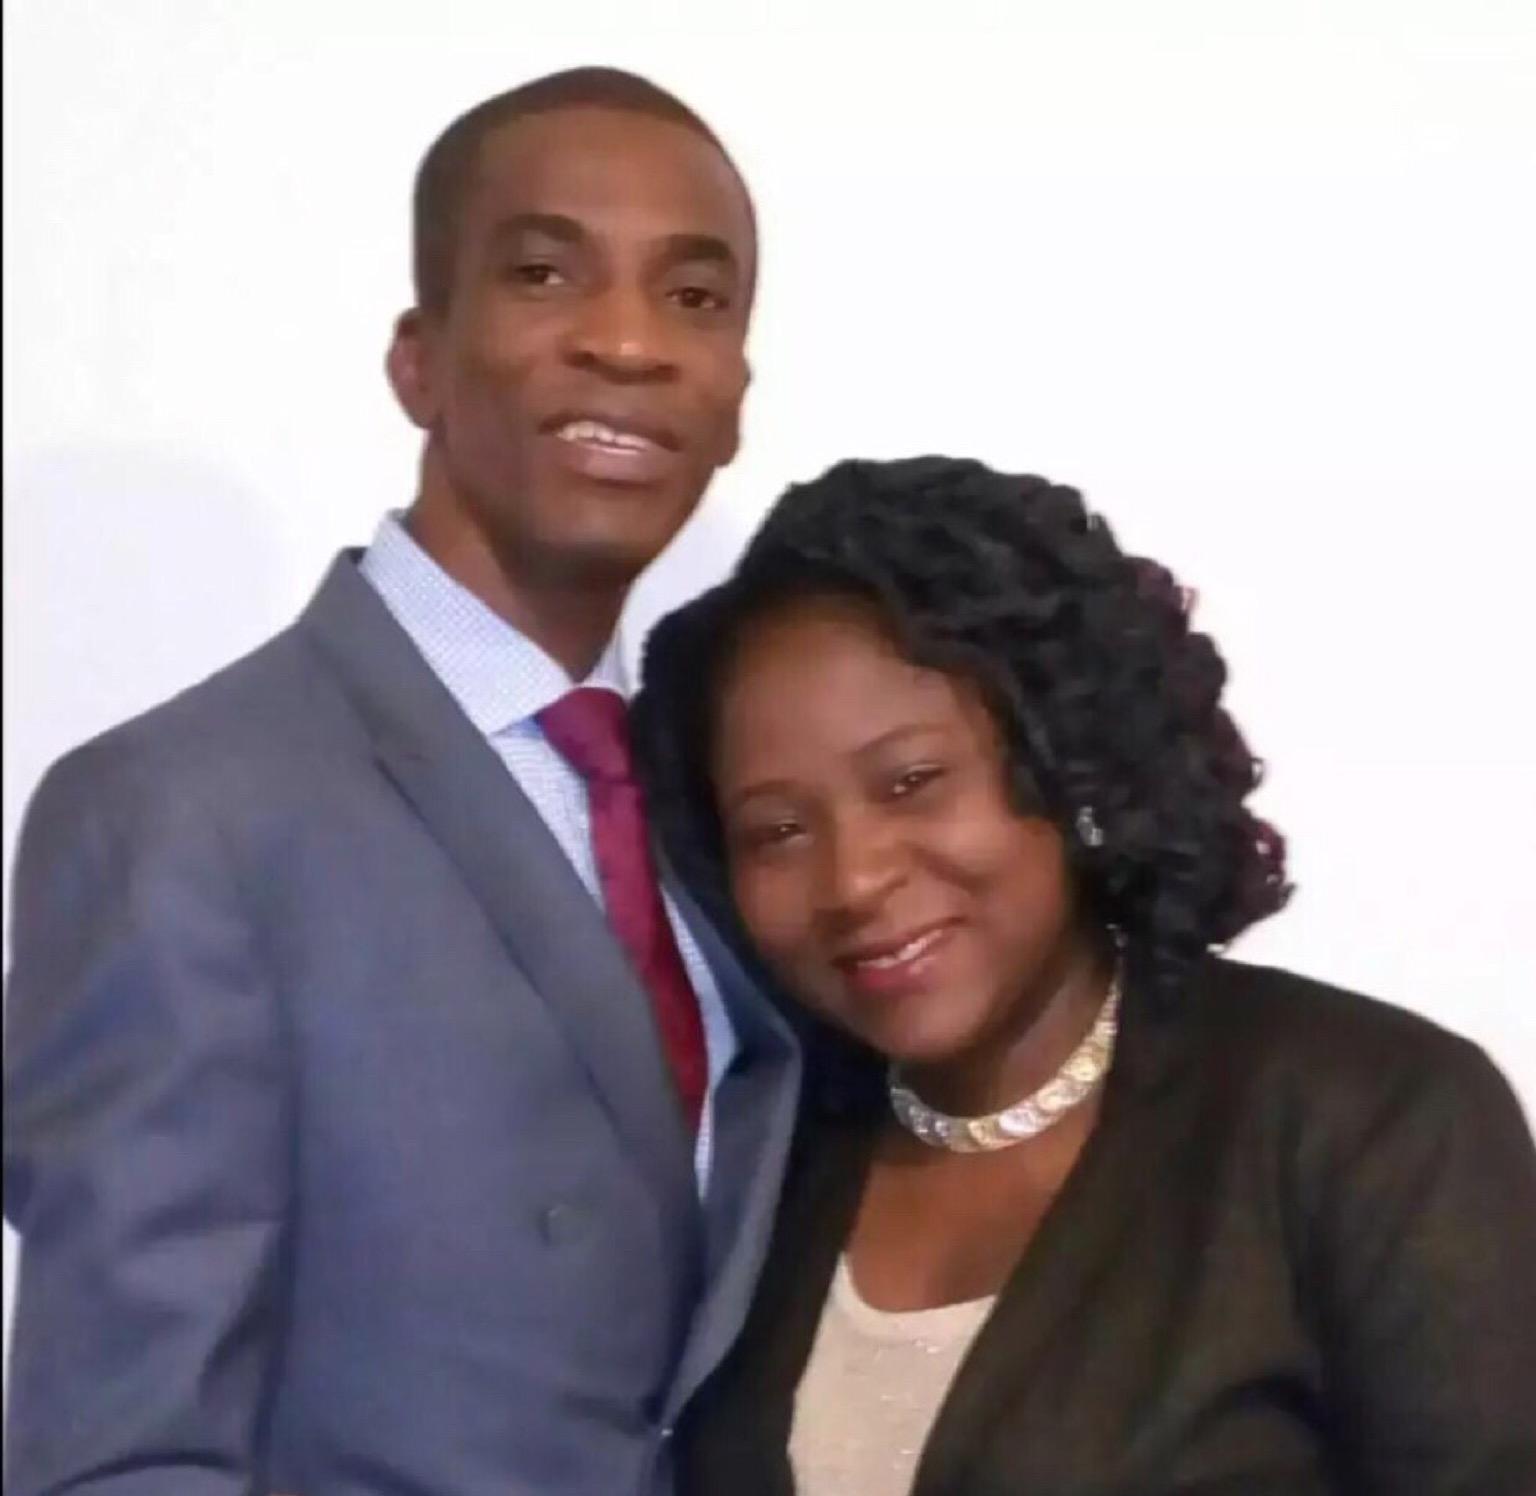 HBD Highly esteemed pastor Bunmi,